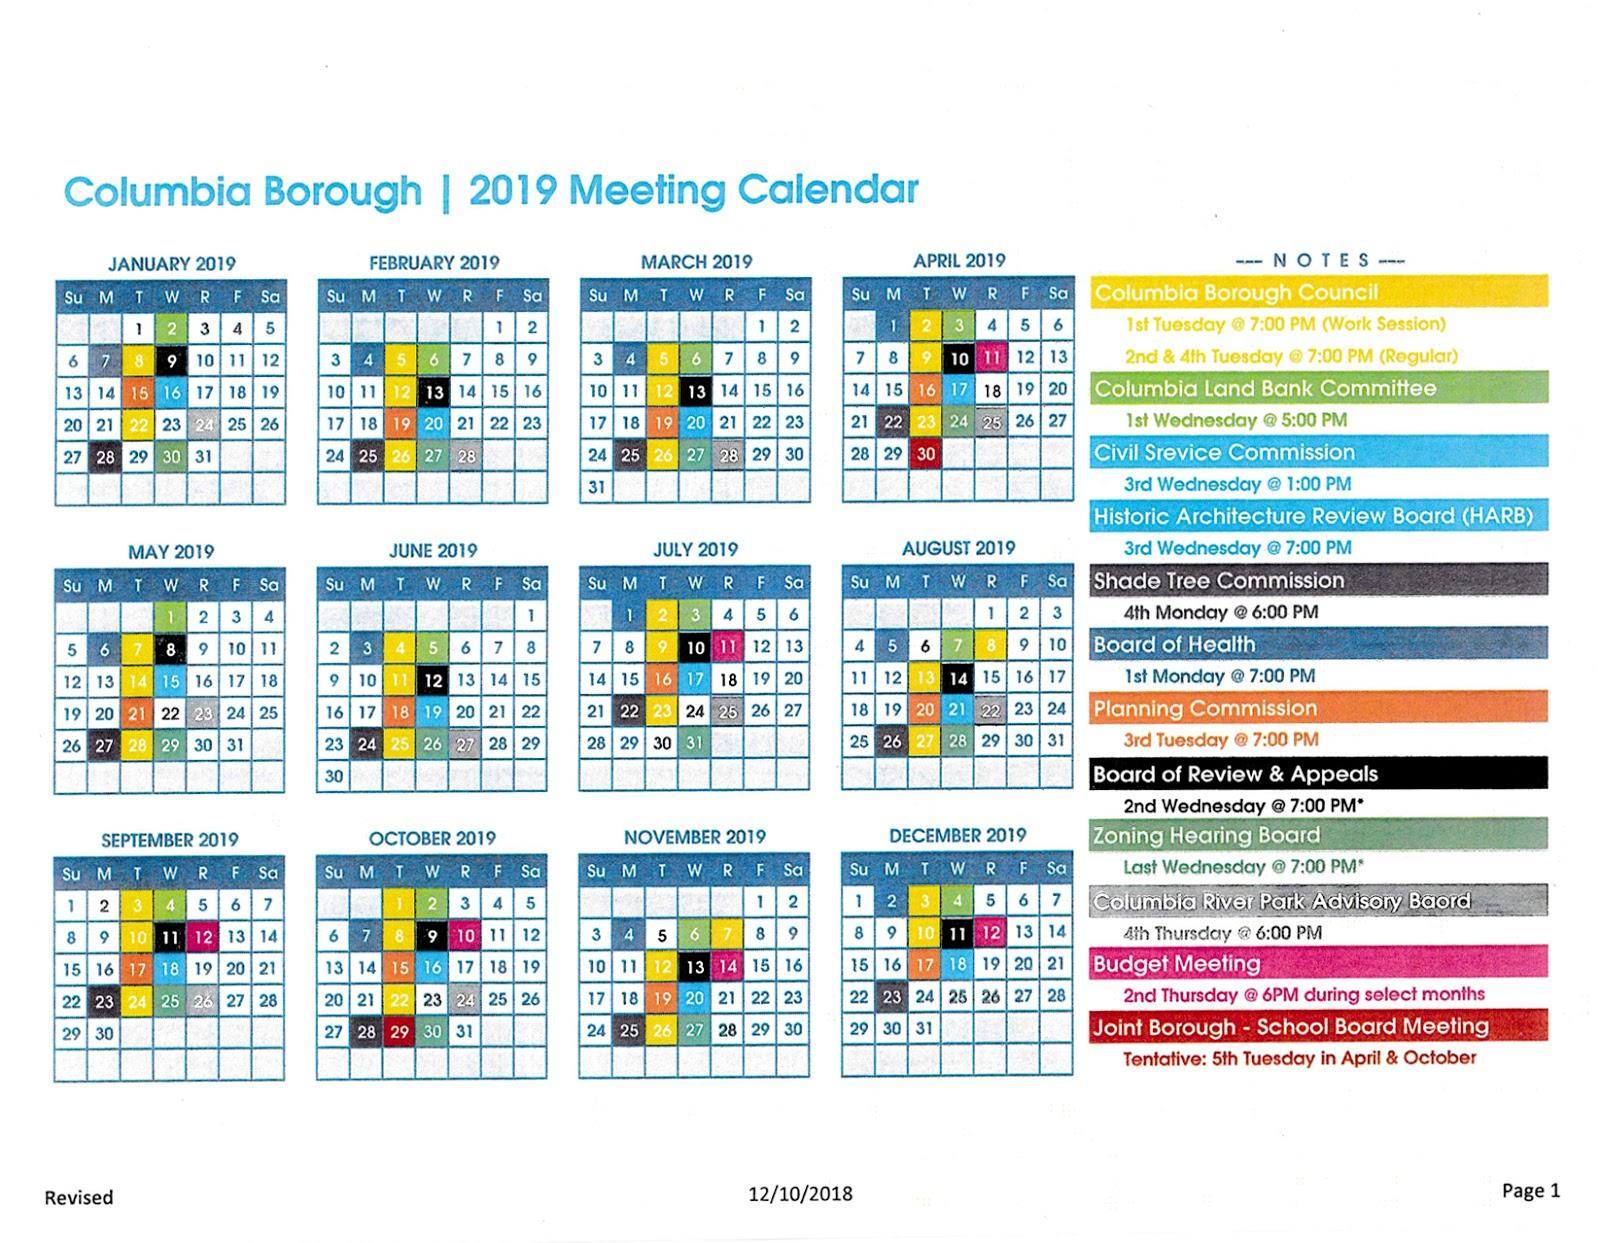 Columbia 2019 Calendar COLUMBIA SPY: 2019 Columbia Borough Meeting Calendar features new